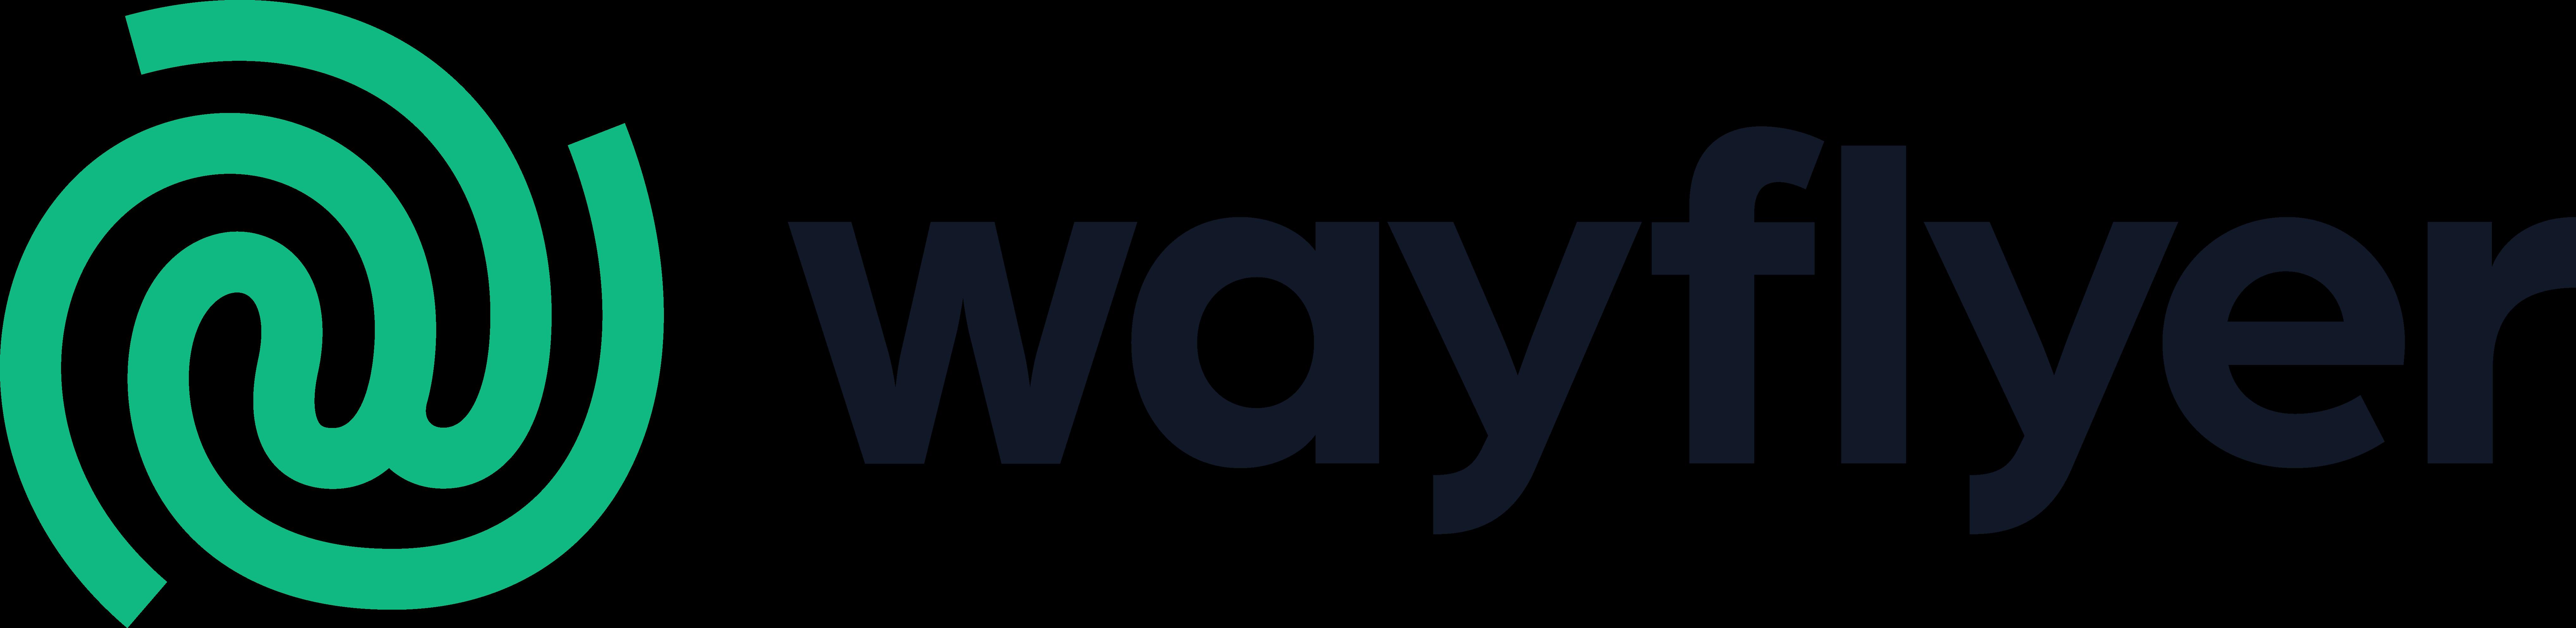 Wayflyer logo